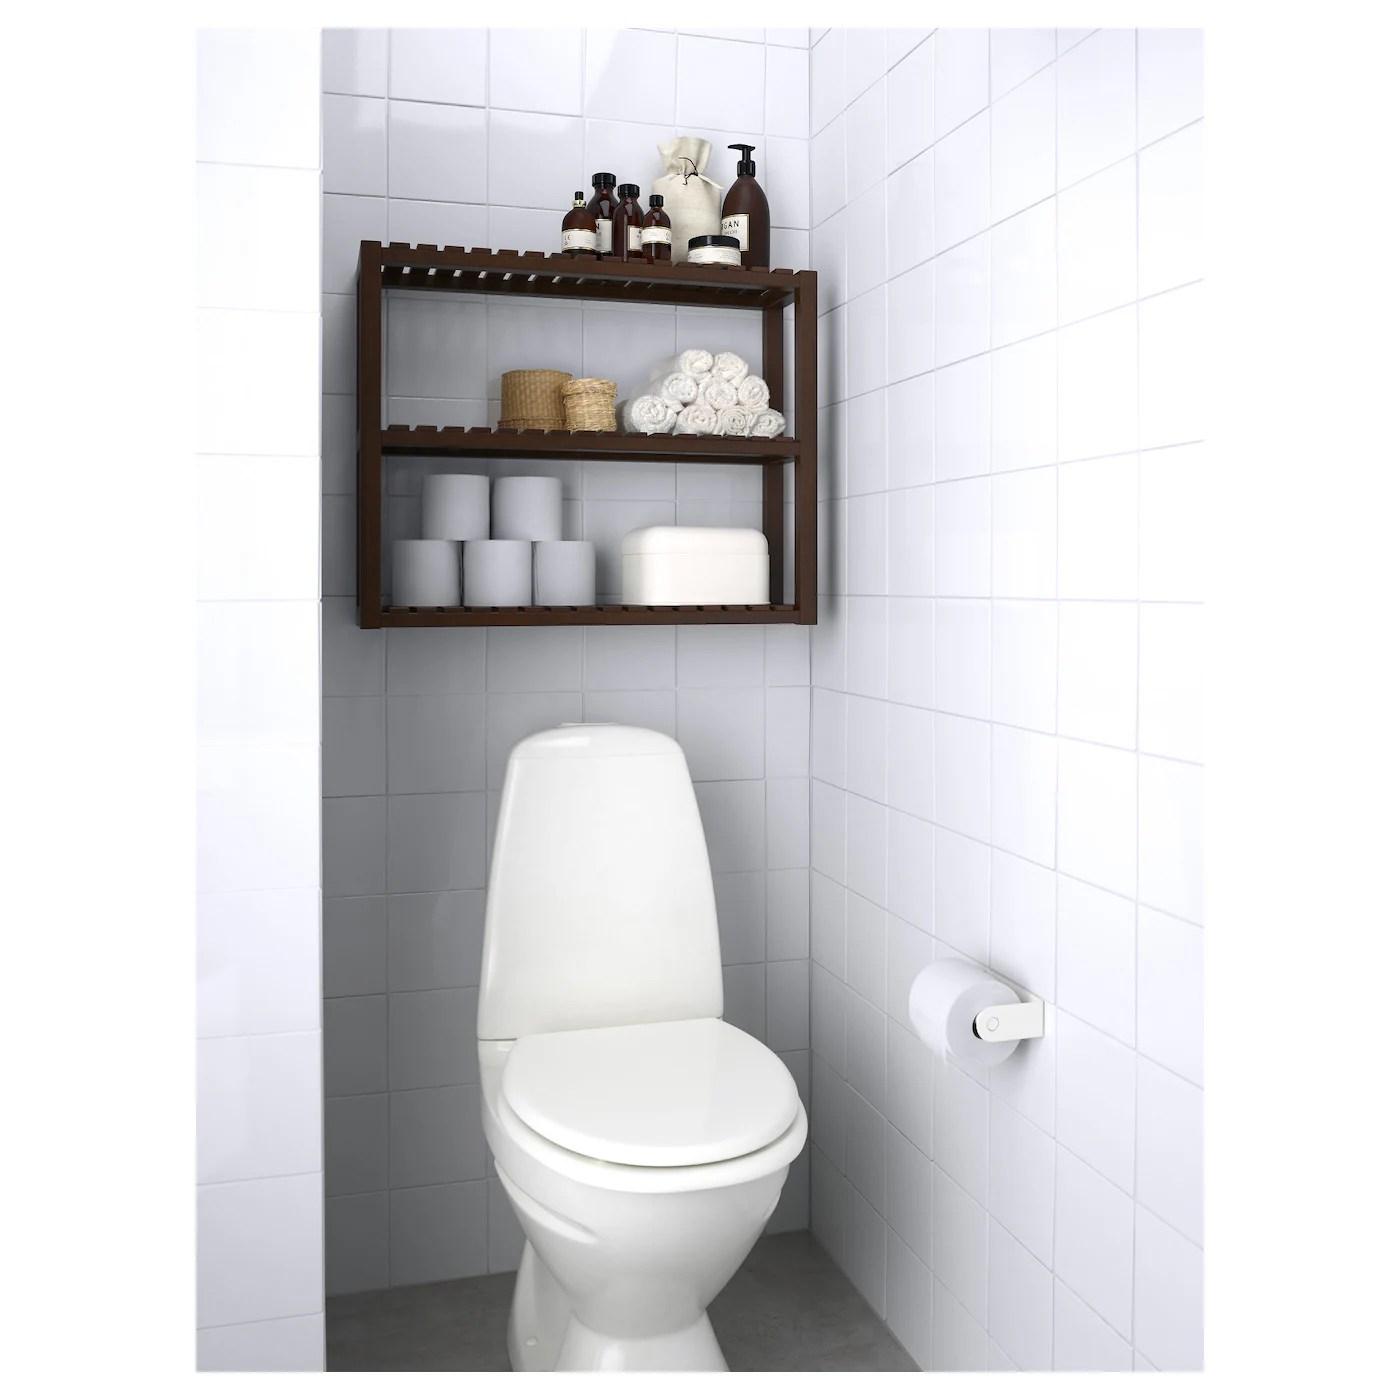 Molger Wall Shelf Dark Brown 68x54 Cm Ikea